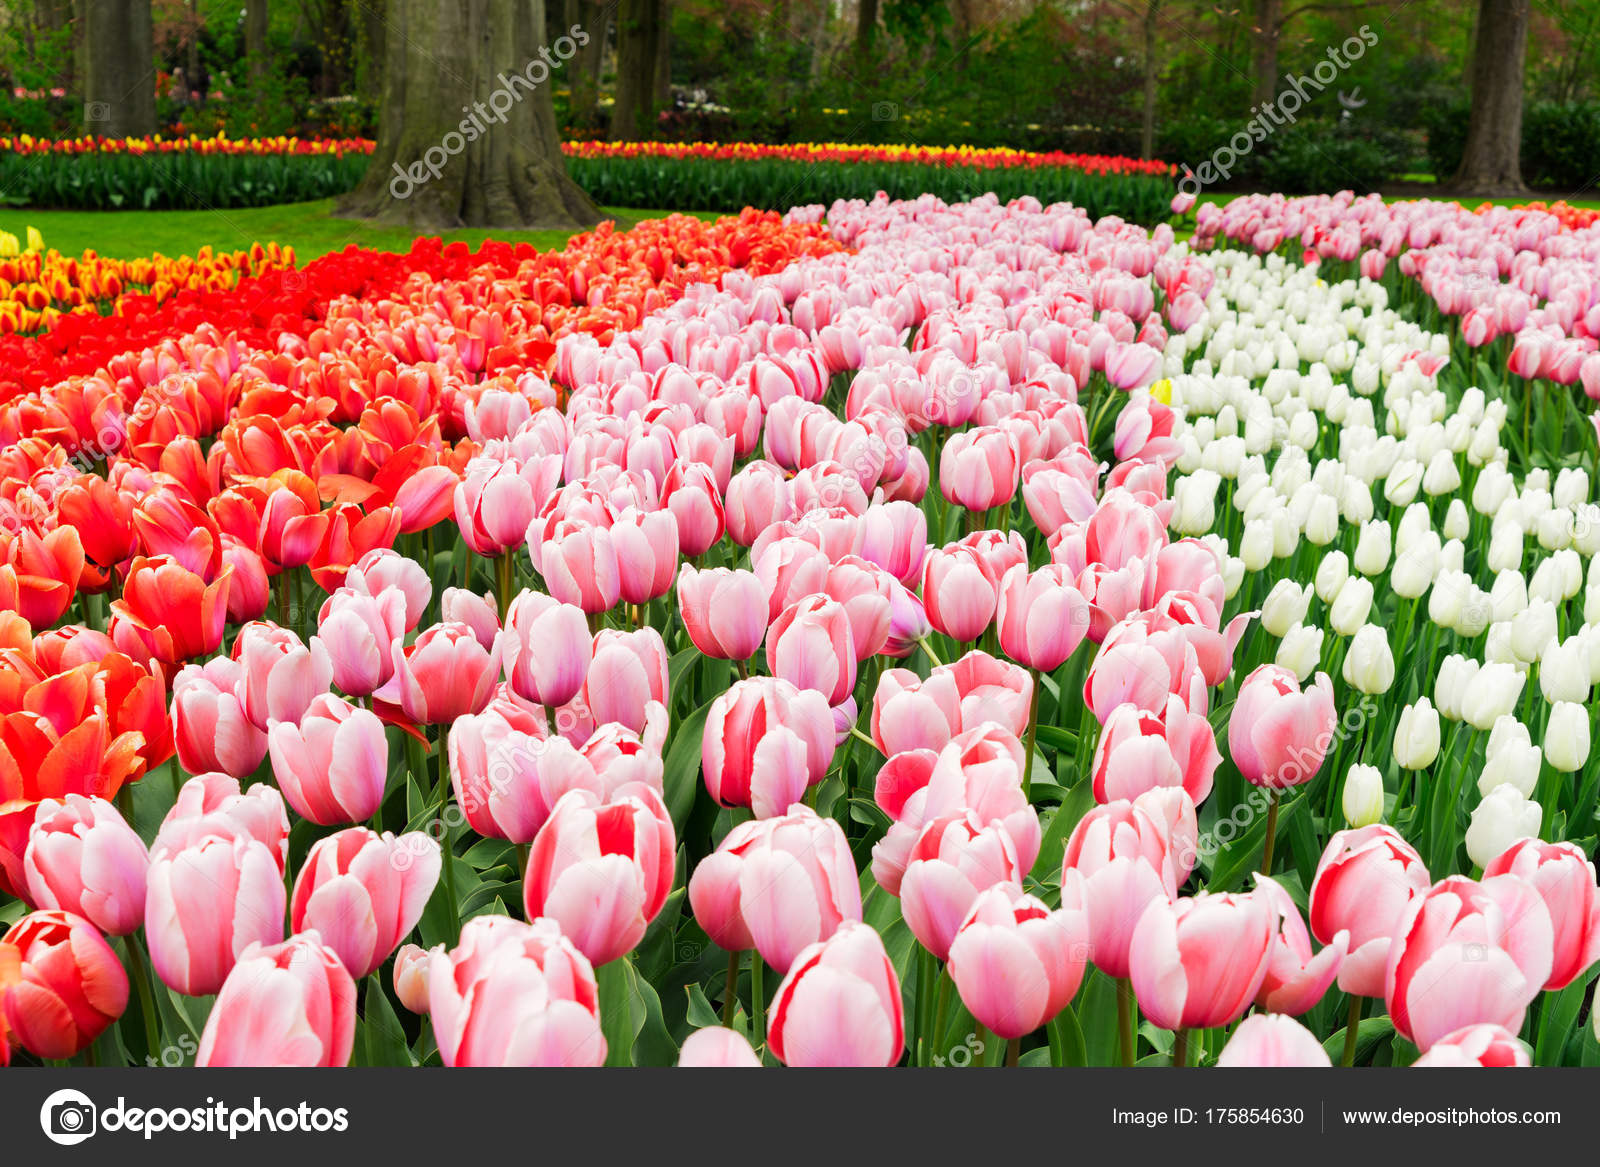 d6cc7e9b4fec Filas de flores de tulipán — Foto de stock © Neirfys  175854630